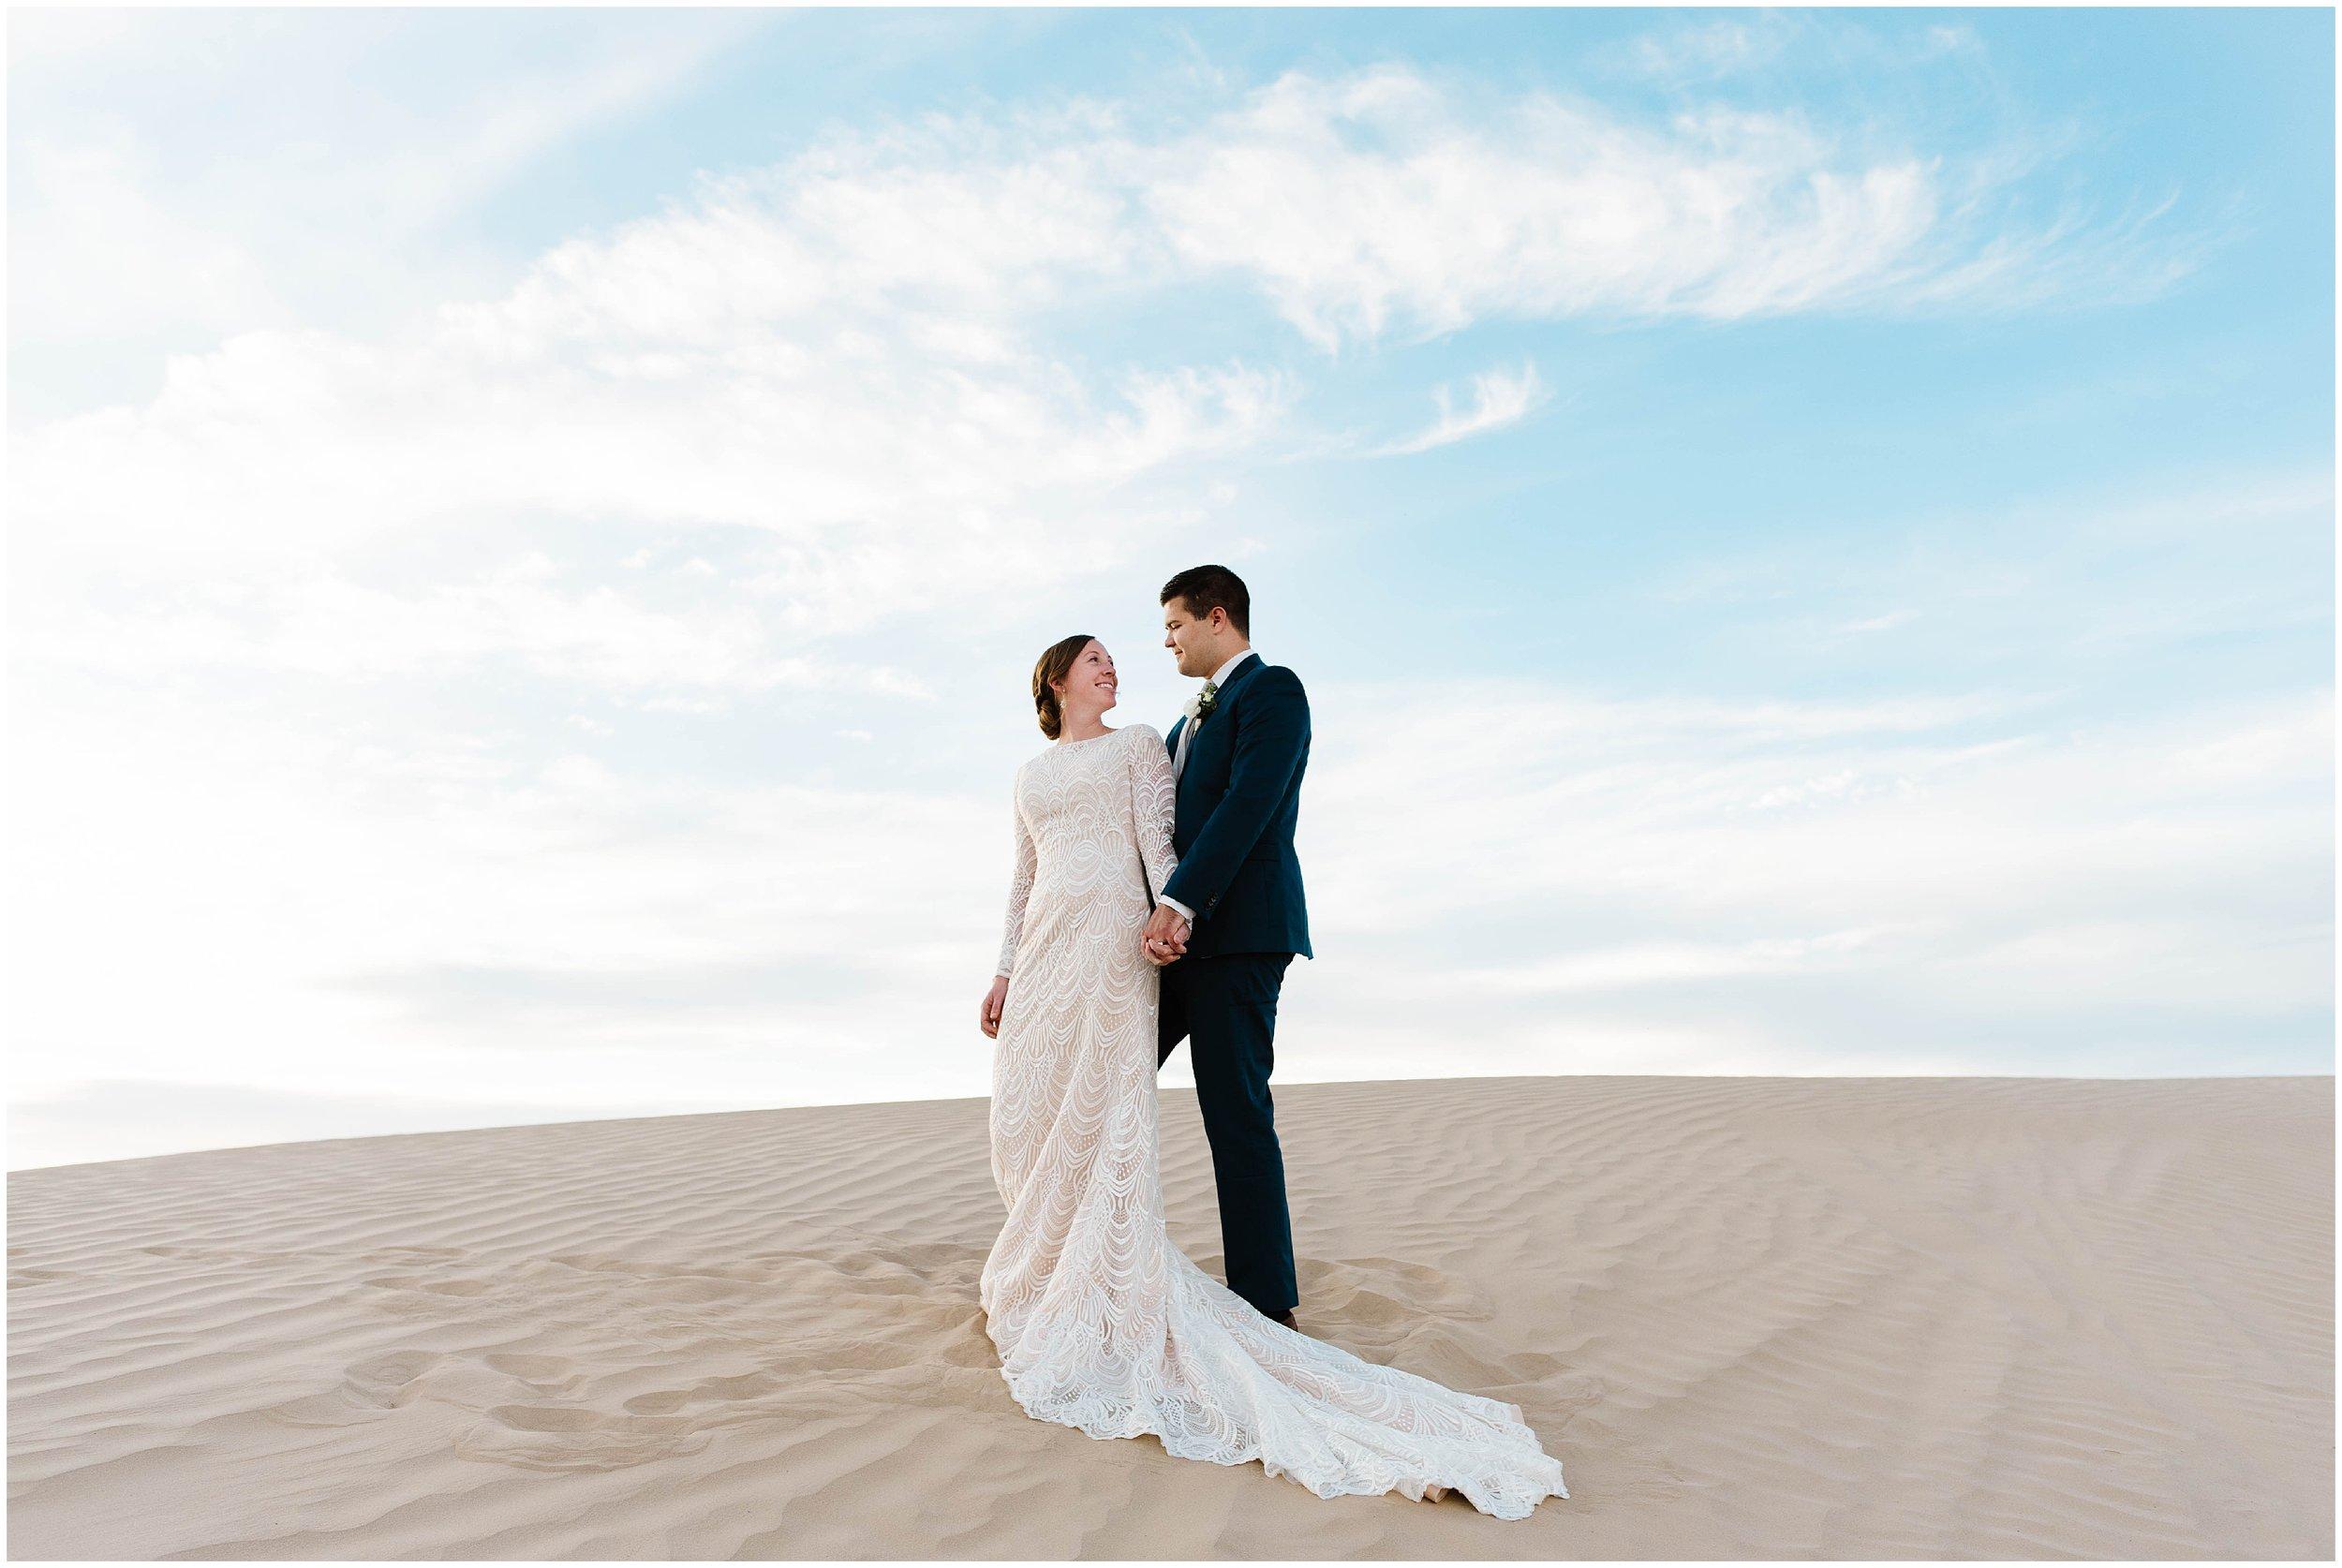 little-sahara-sand-dunes-wedding-amber-lynne-photography.jpg11.jpg